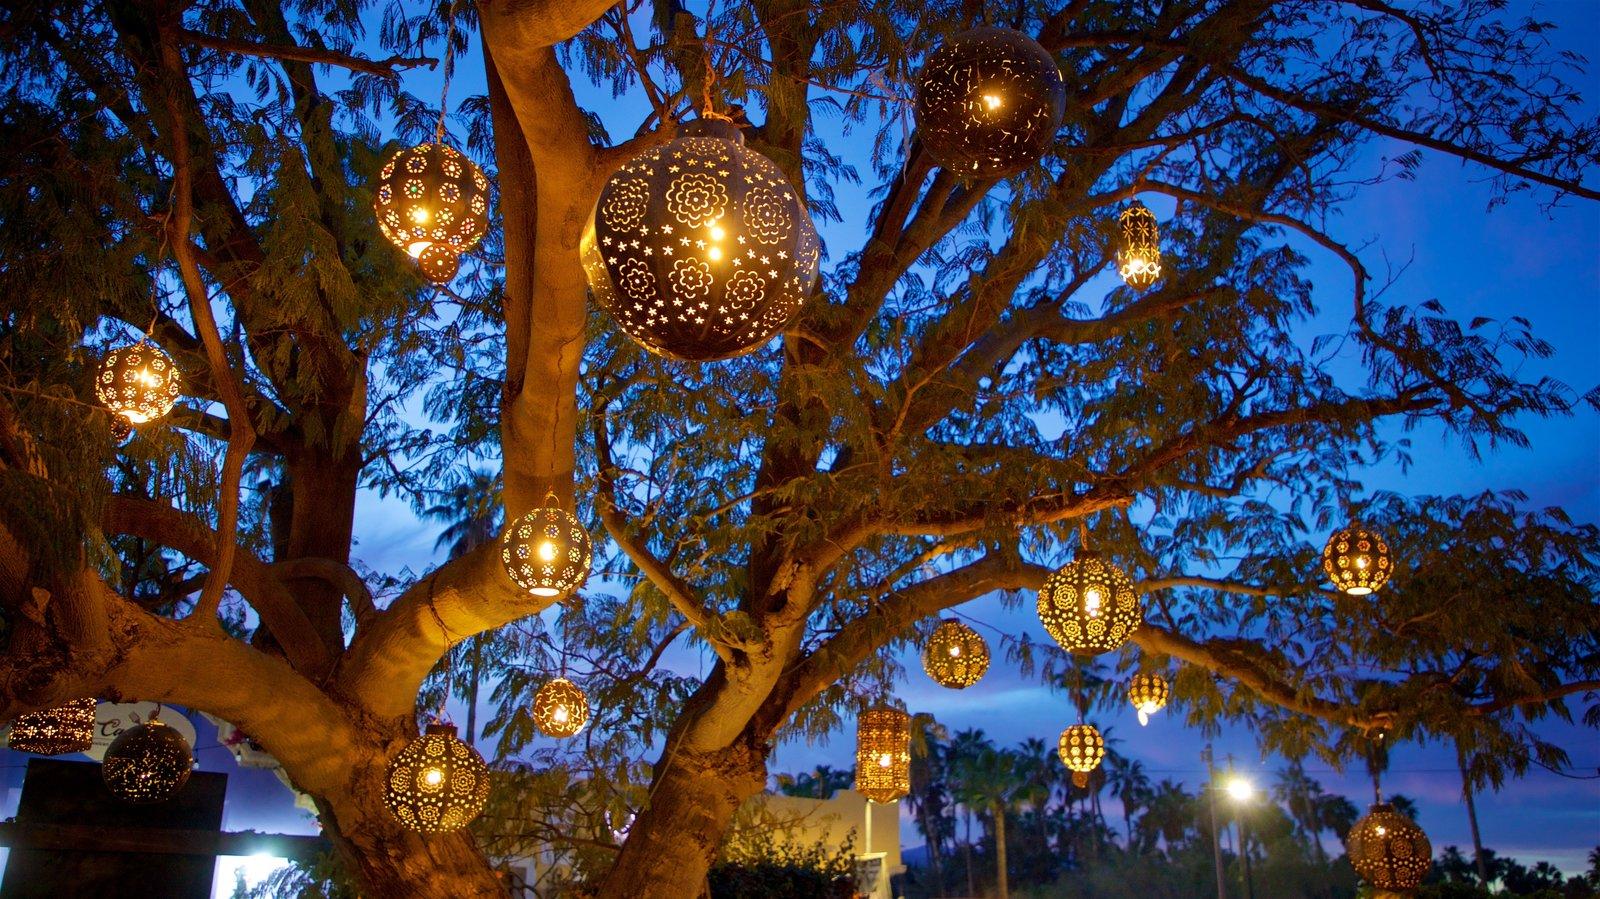 San Jose del Cabo Art District which includes night scenes and a garden